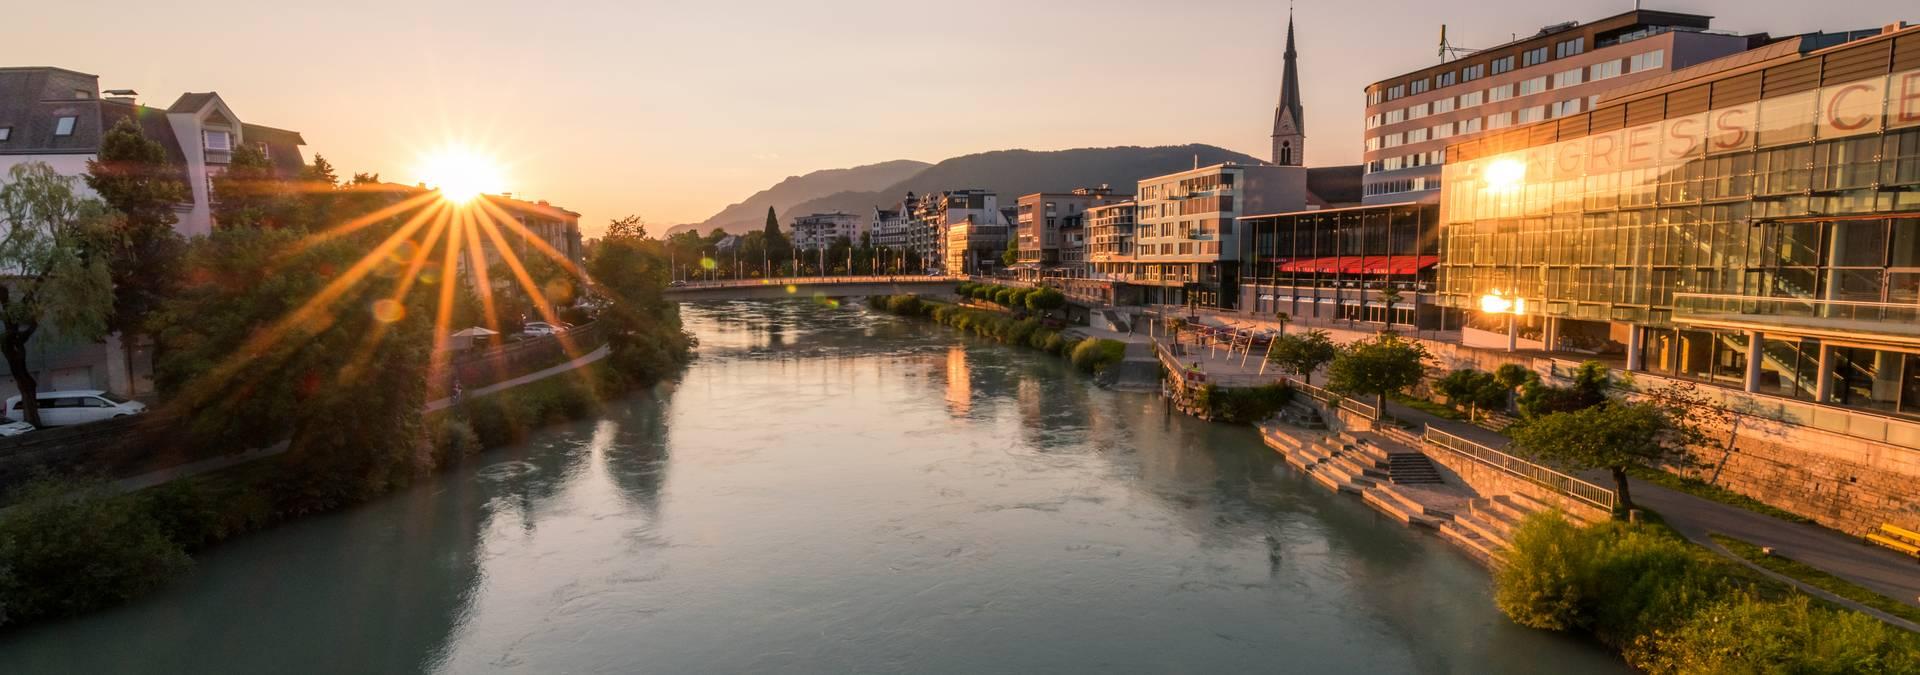 Sonnenuntergang in Villach